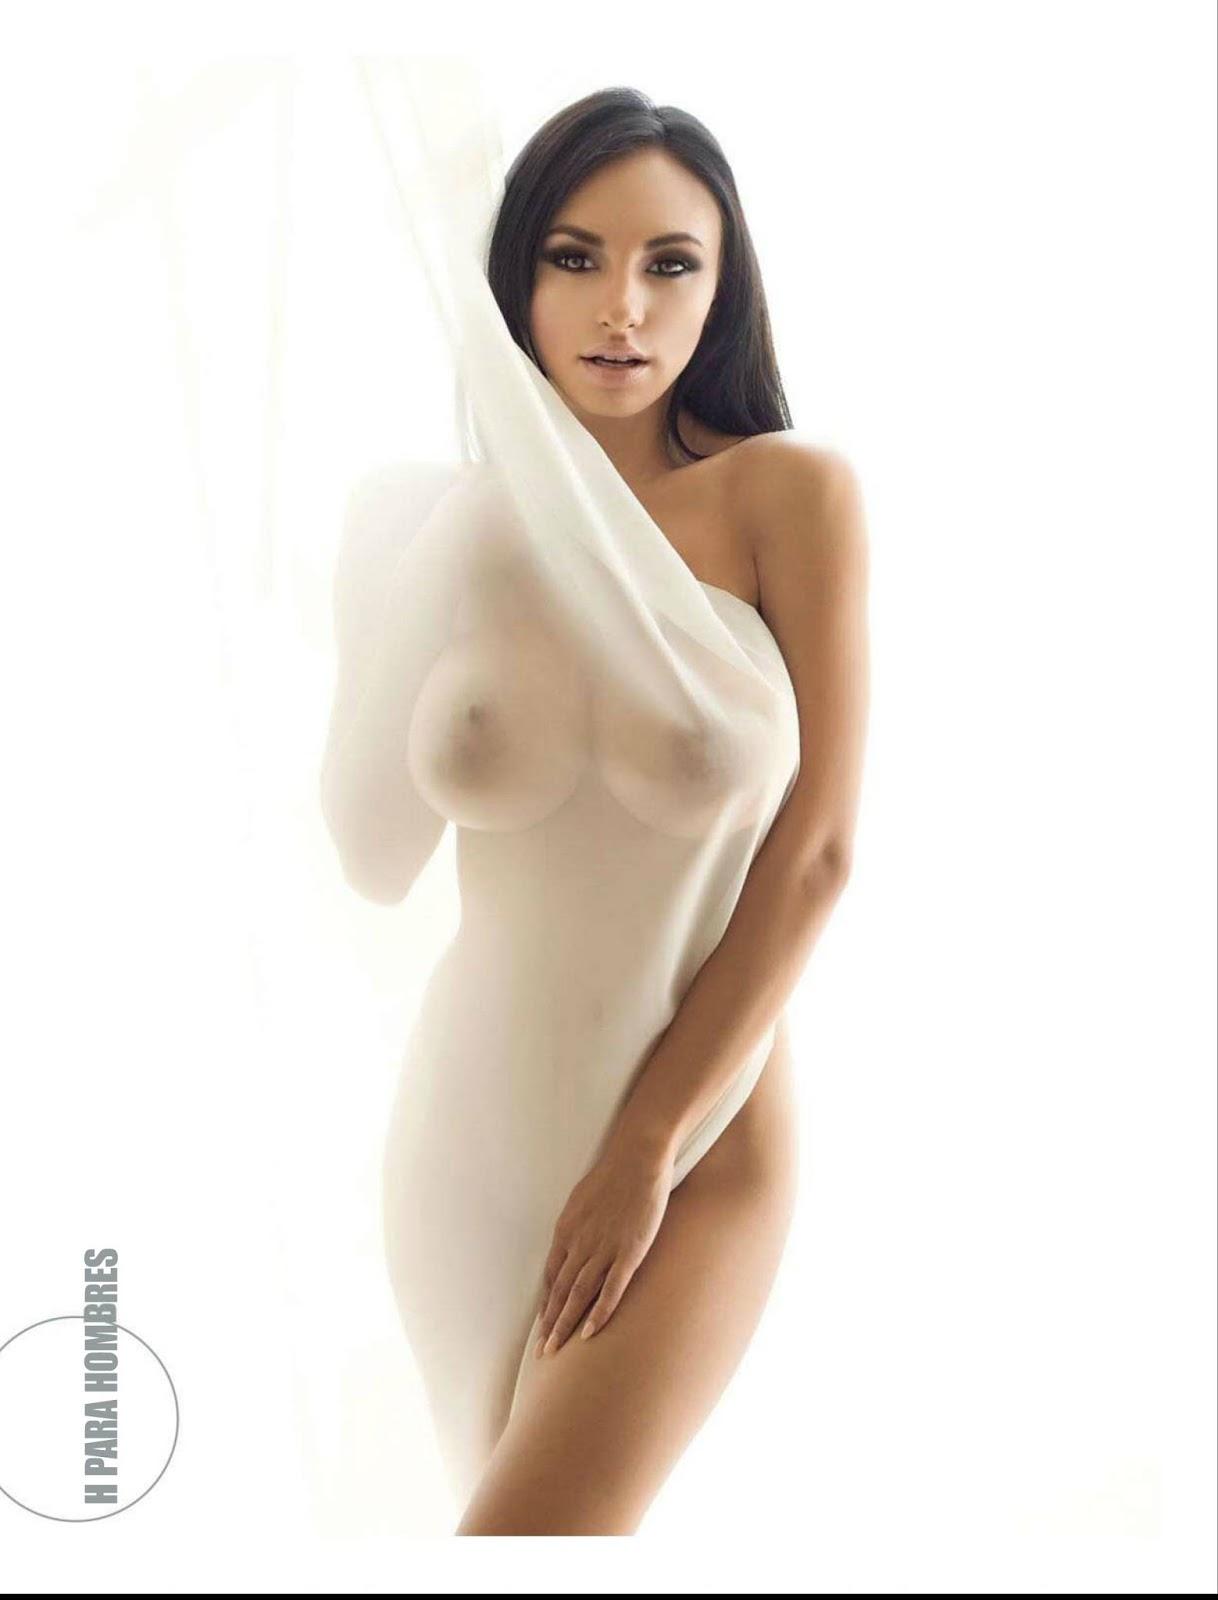 Iryna Ivanova @IrynaIvanova featured in H Extremo Magazine ...